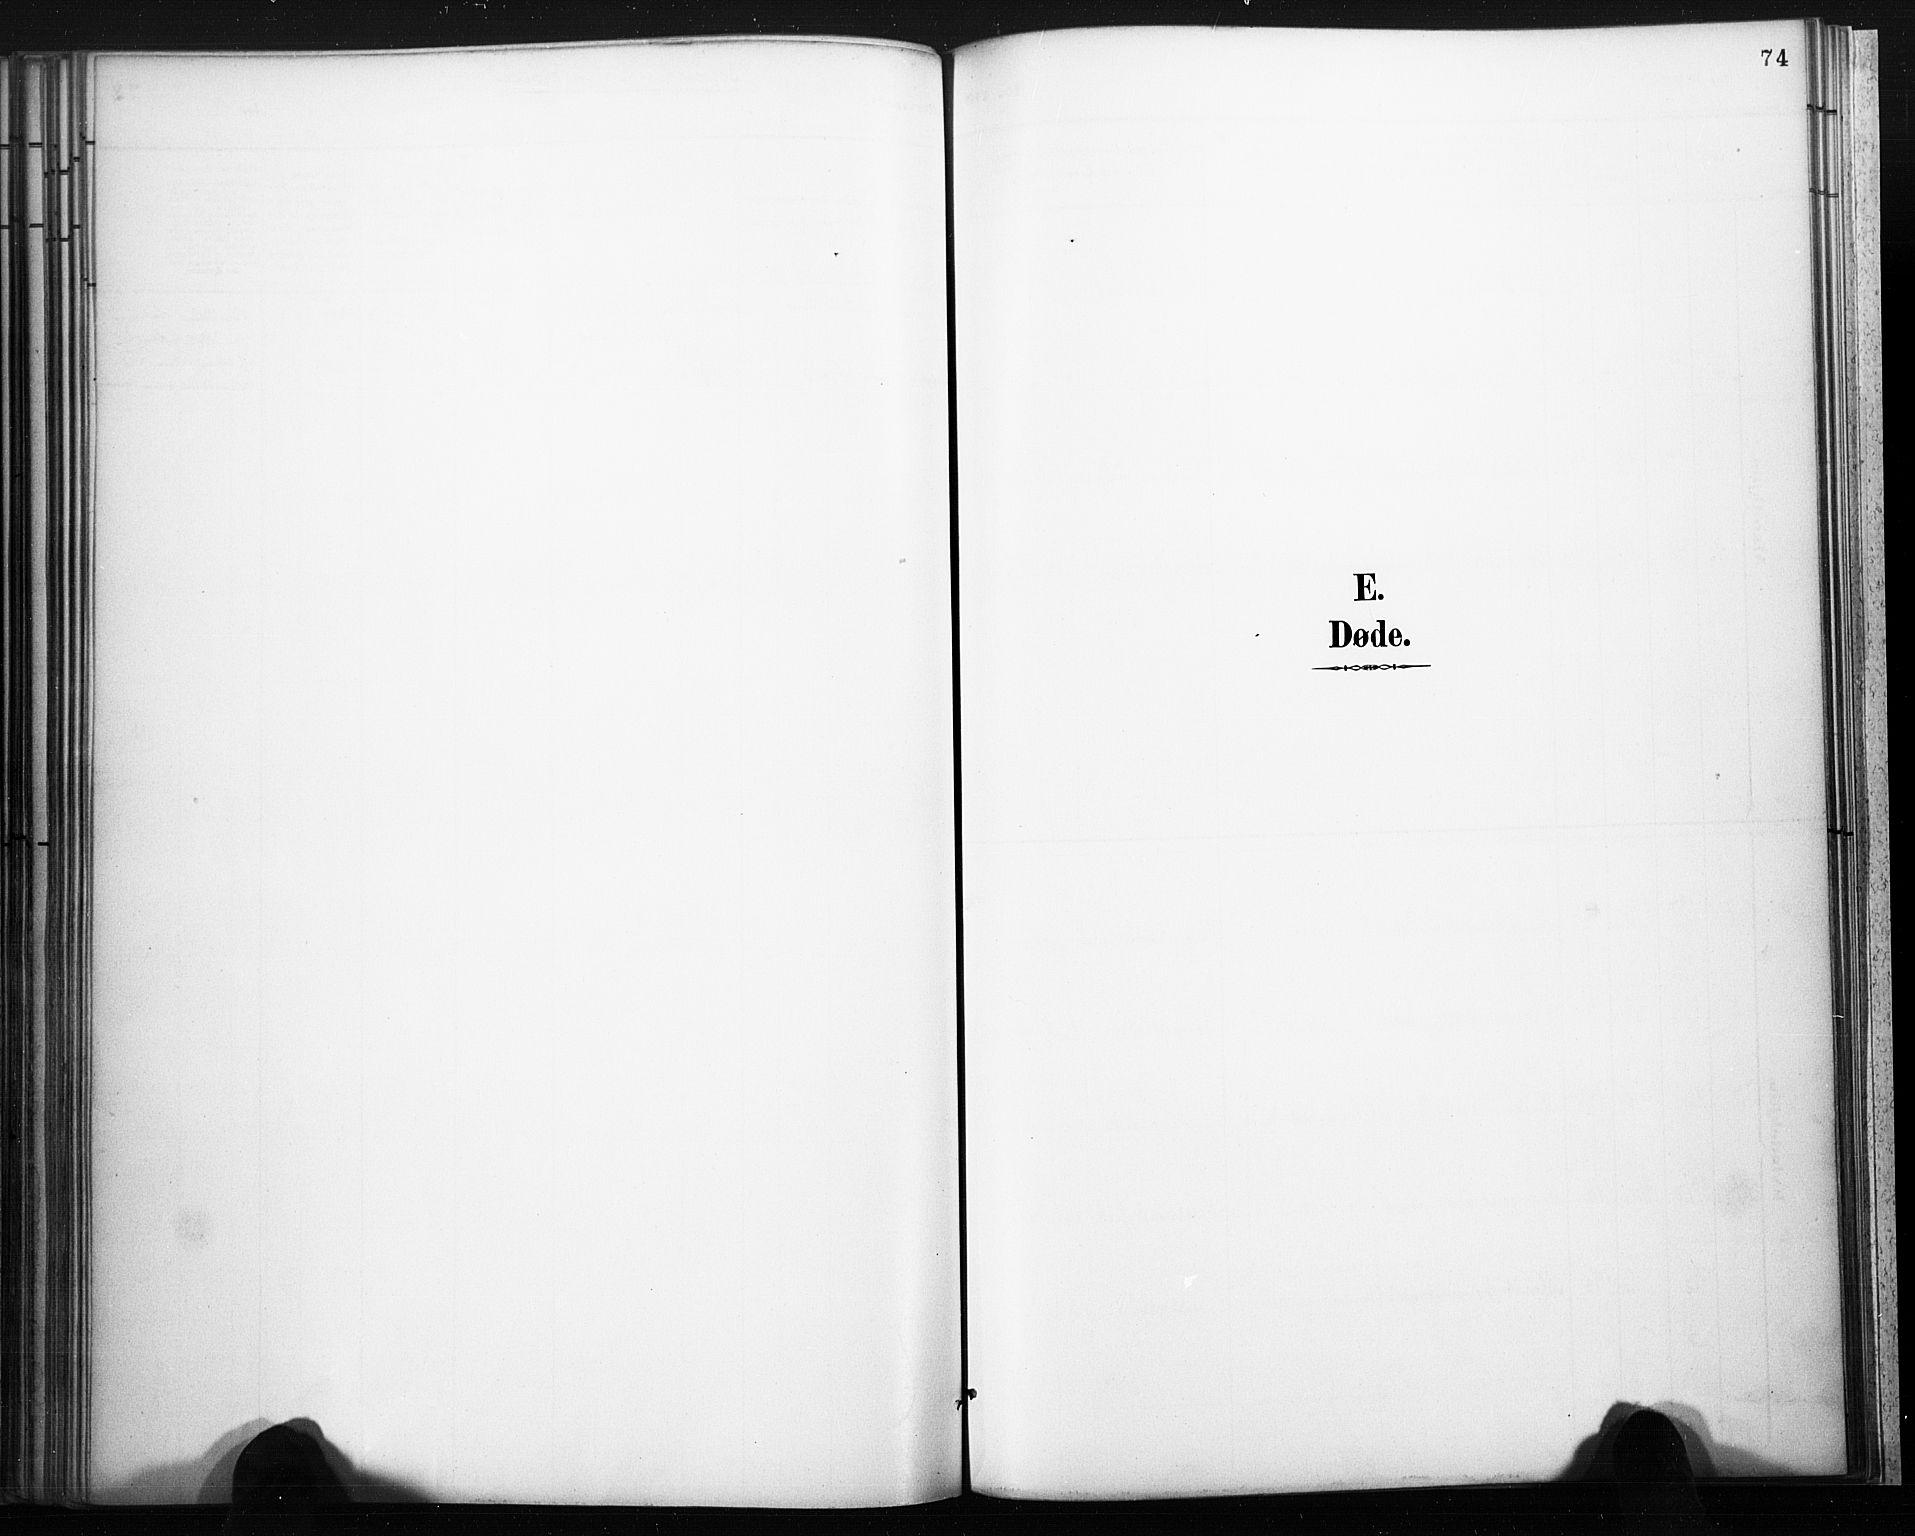 SAKO, Lårdal kirkebøker, F/Fb/L0002: Ministerialbok nr. II 2, 1887-1918, s. 74